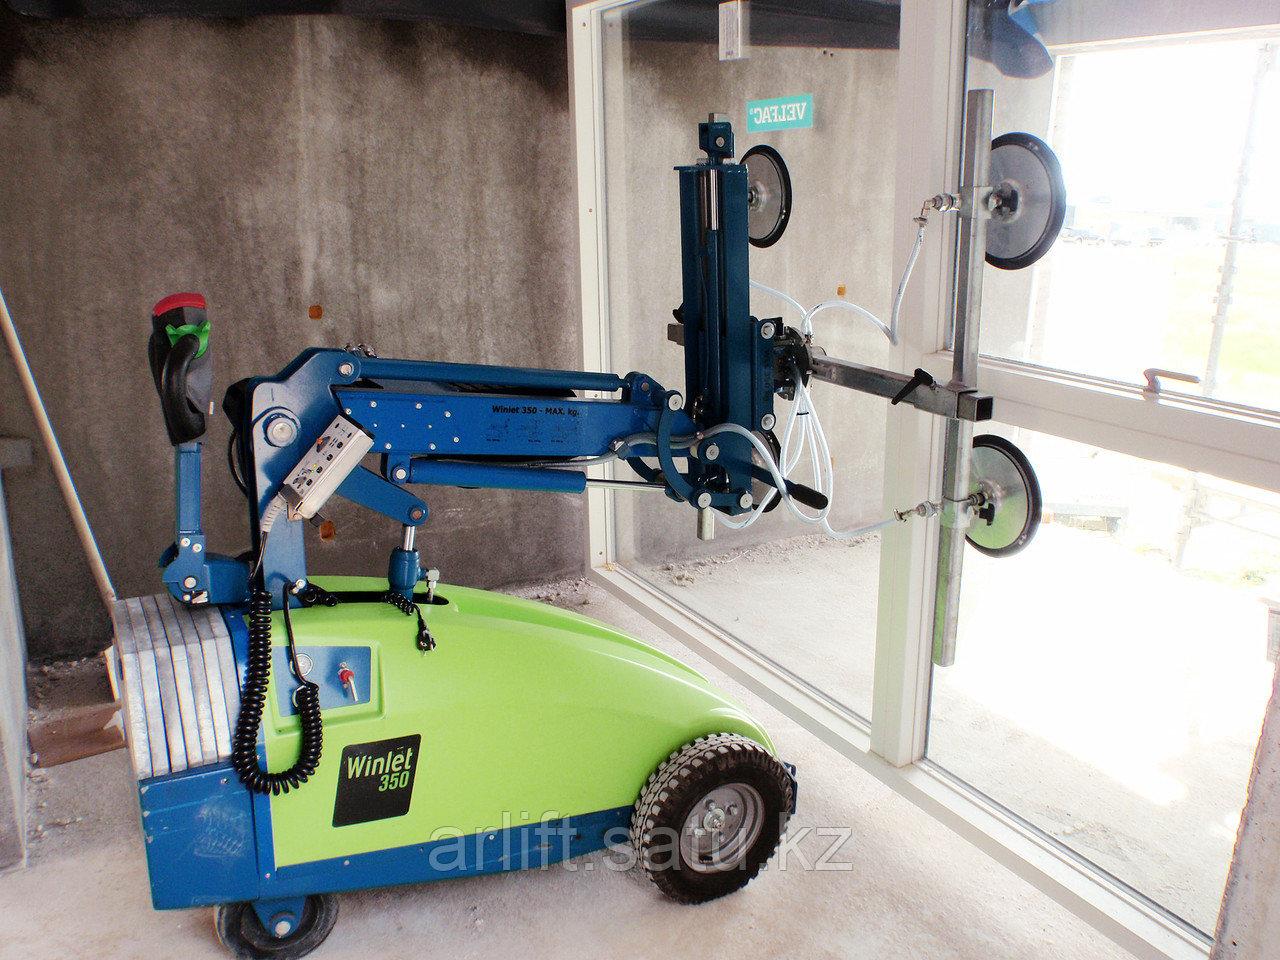 Стекло-робот 575 - фото 5